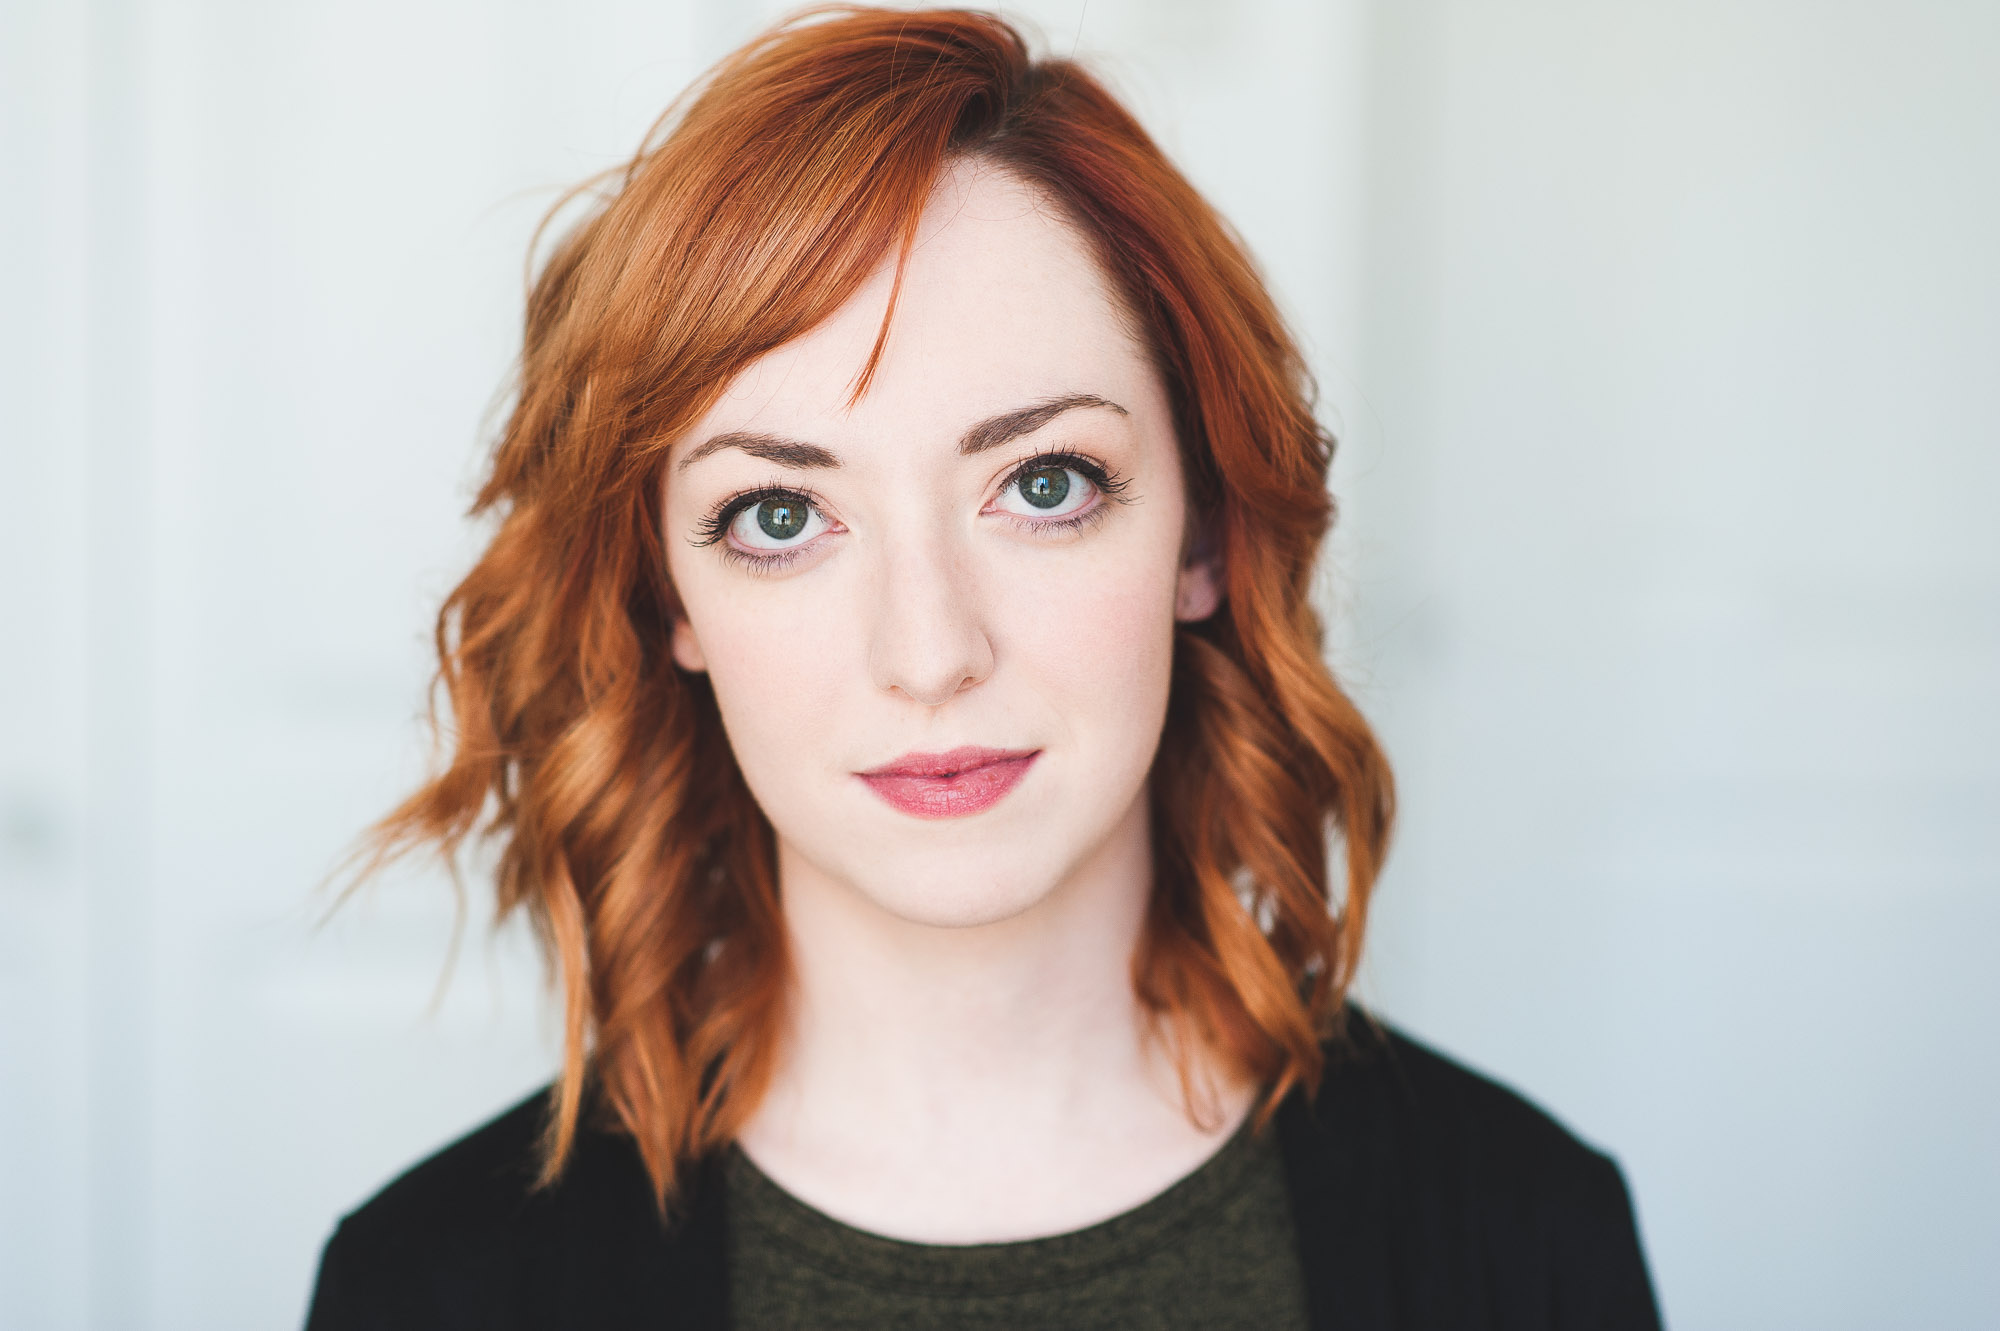 headshot-Montreal-actress-Samantha-Bitonti